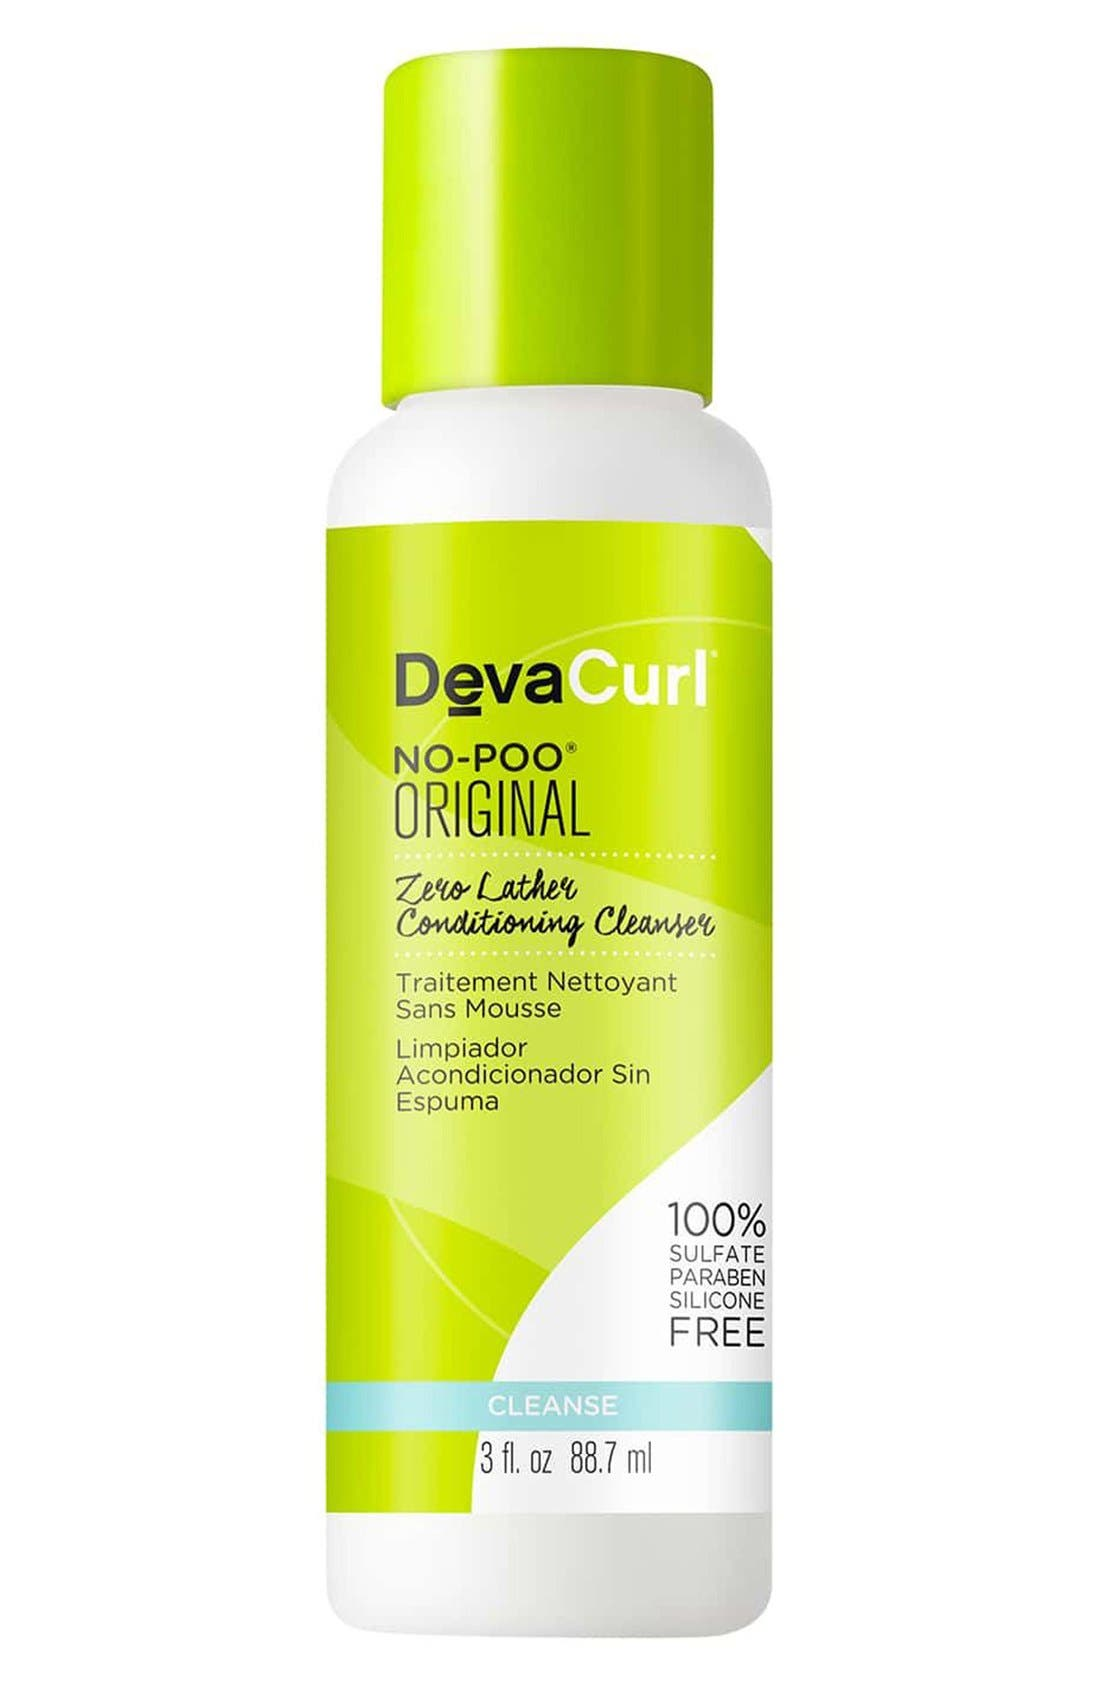 DevaCurl No-Poo™ Original Zero Lather Conditioning Cleanser (Travel Size)